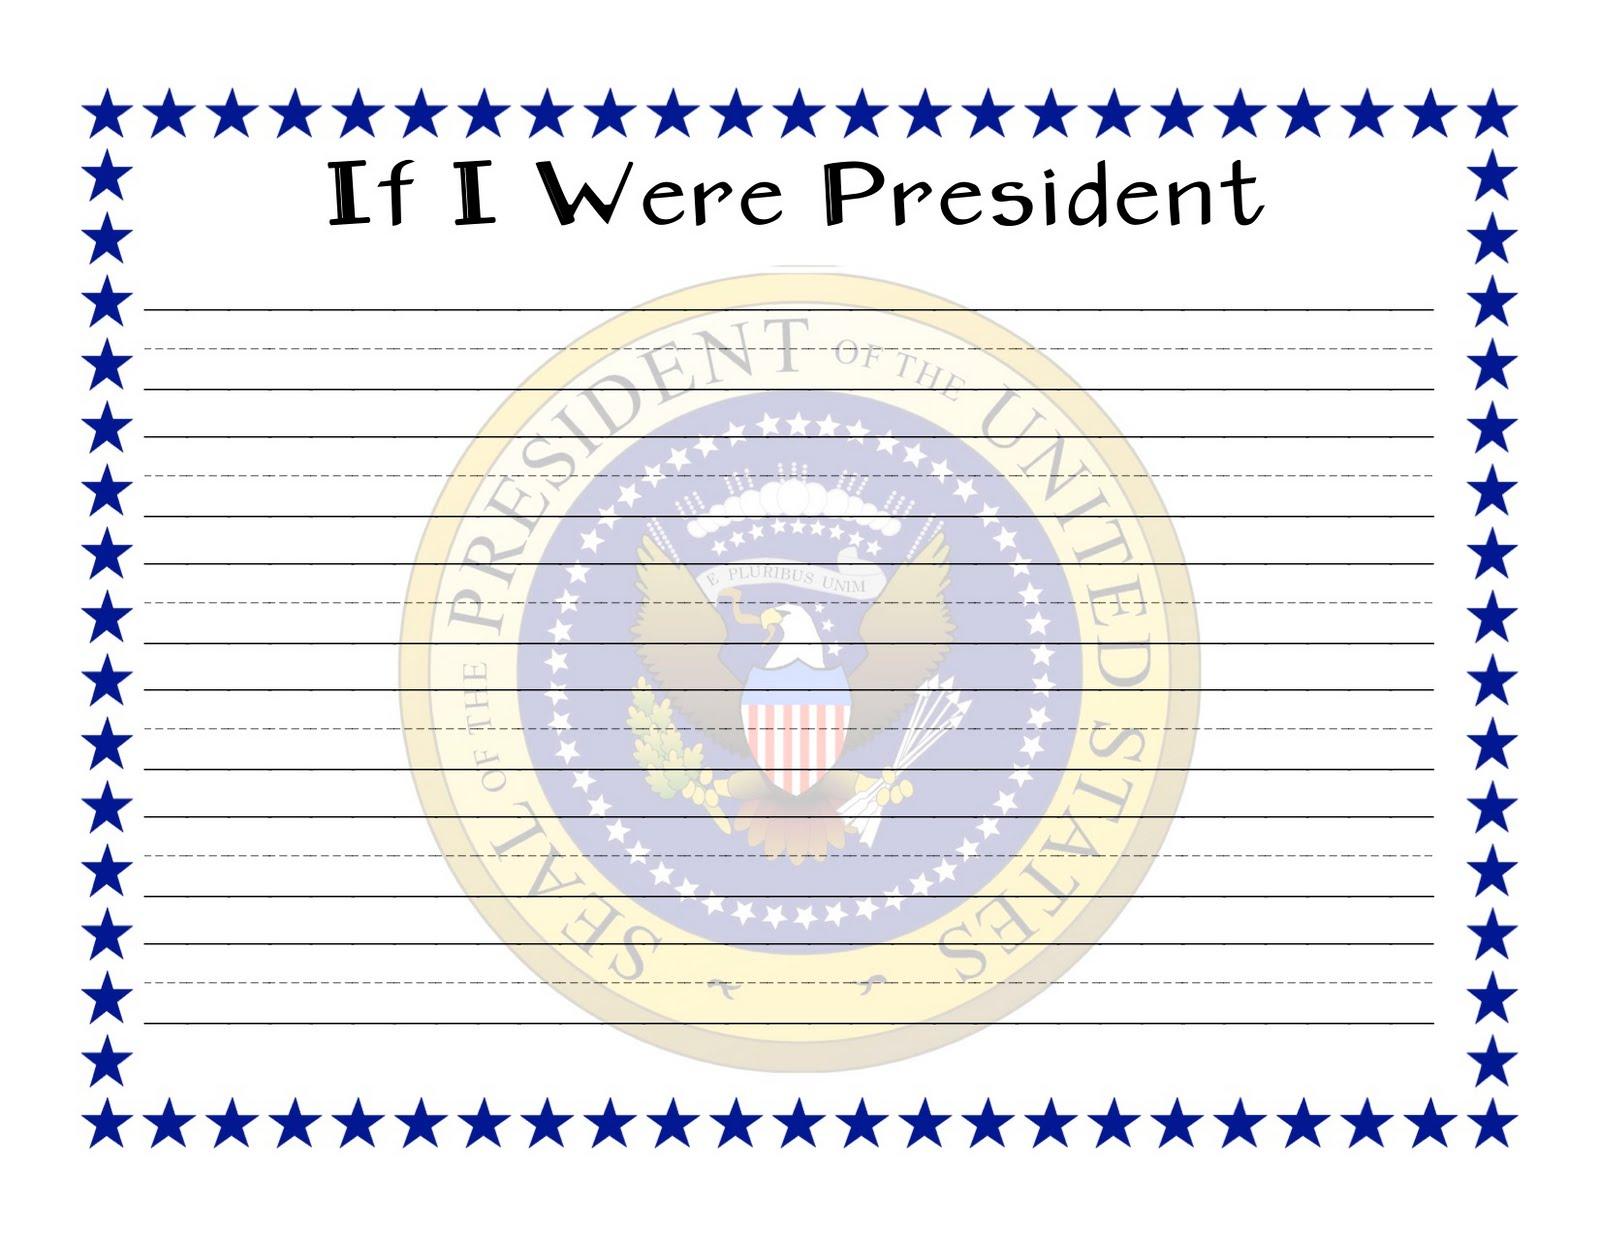 If i were president essay